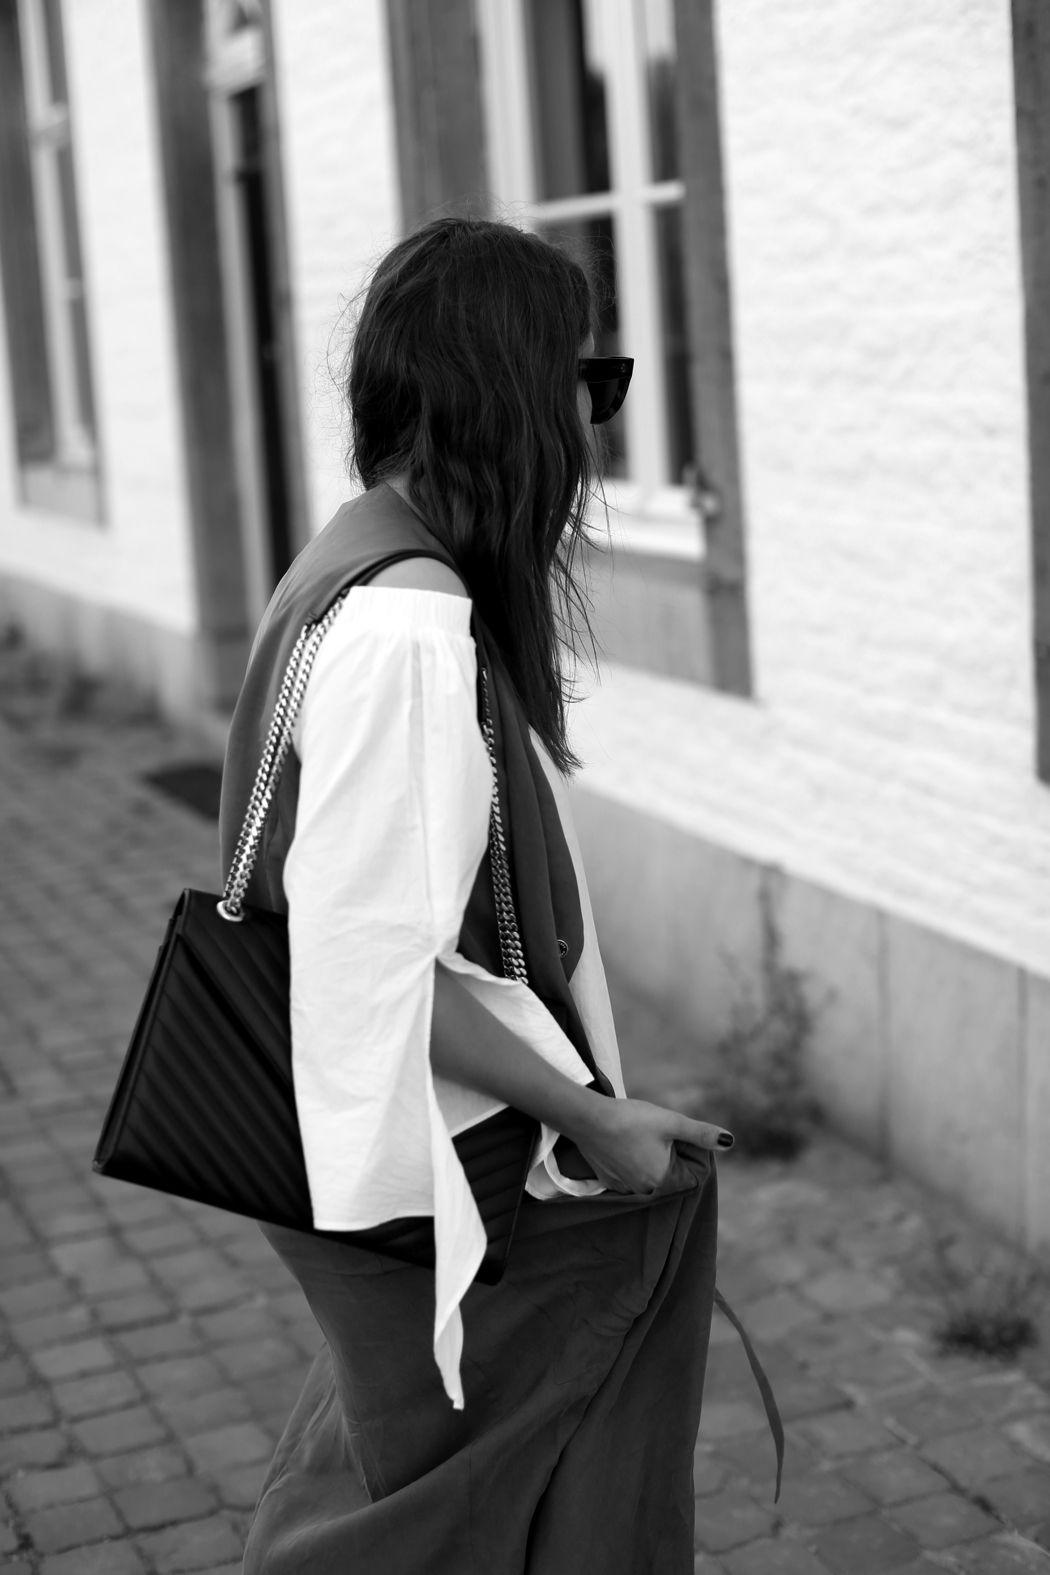 KHAKI SILK | Fiona from thedashingrider.com wears a white off-shoulder blouse, a olive Belstaff vest, a Saint Laurent leather bag and Céline Caty sunglasses | Petite Blogger | Style Blogger | Outfit